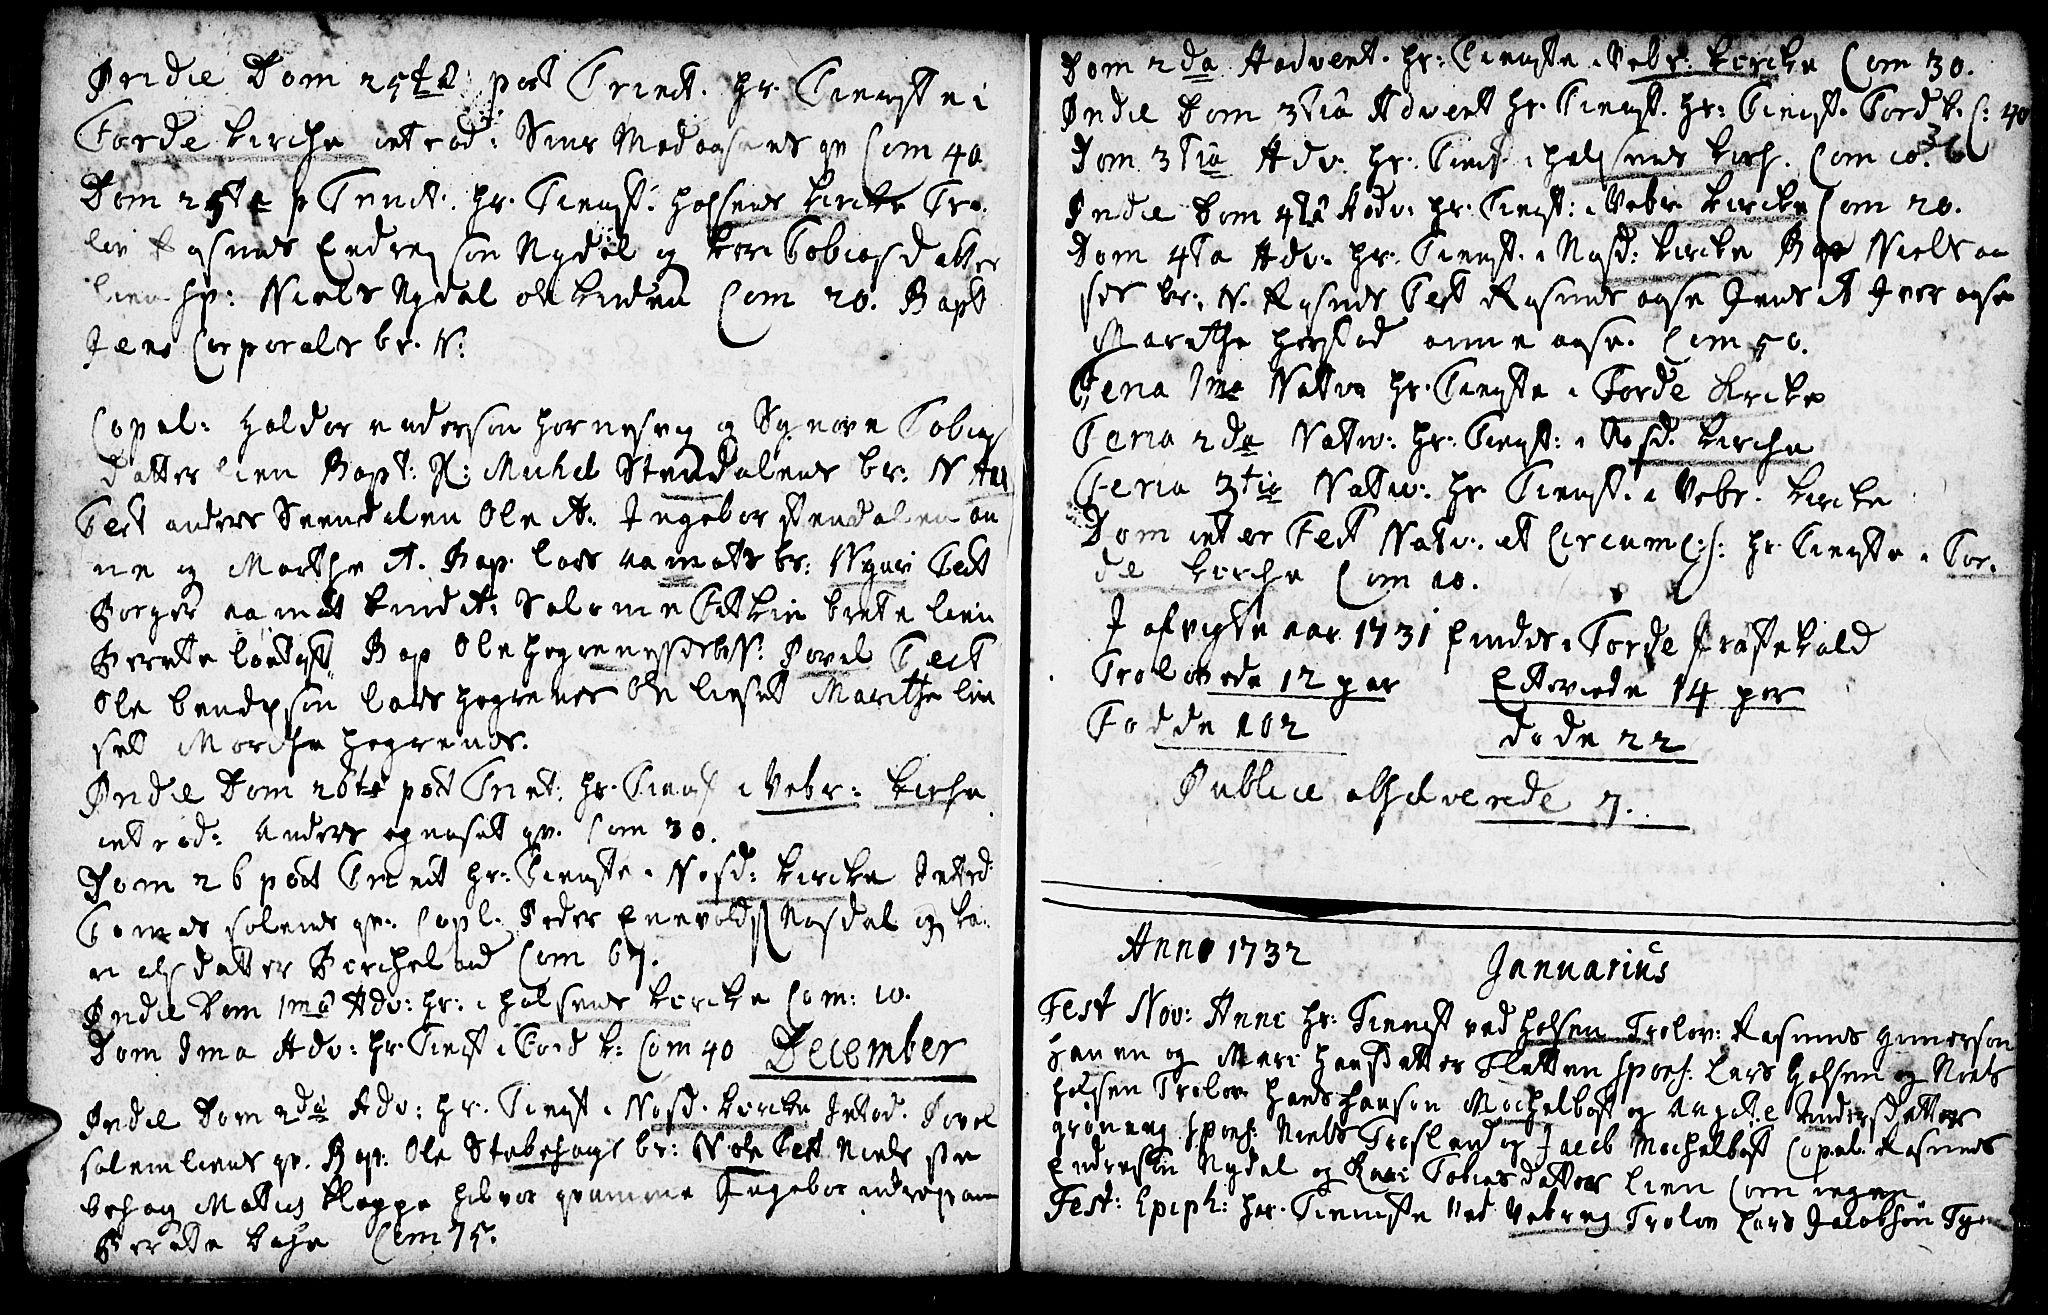 SAB, Førde sokneprestembete, H/Haa: Ministerialbok nr. A 2, 1728-1748, s. 36